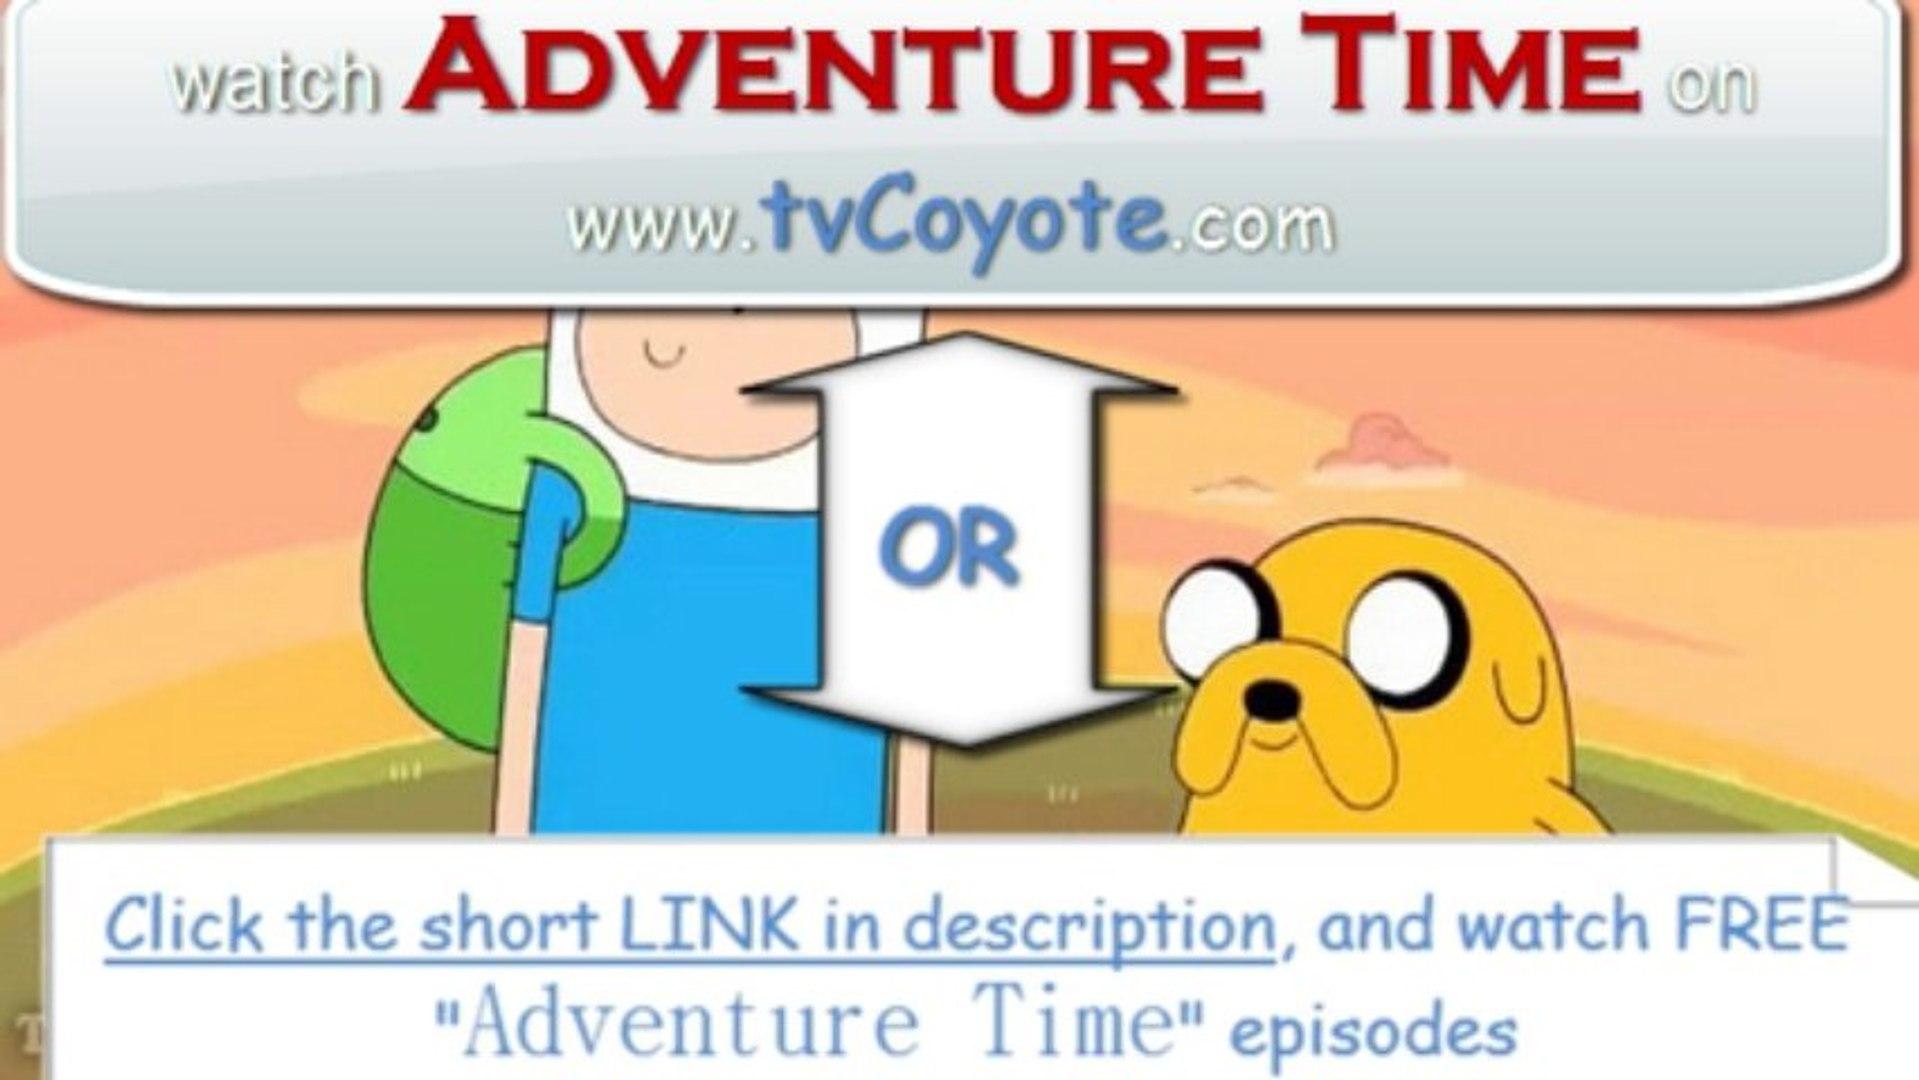 Adventure Time Season 5 Episode 39 - We Fixed a Truck - HDTV -